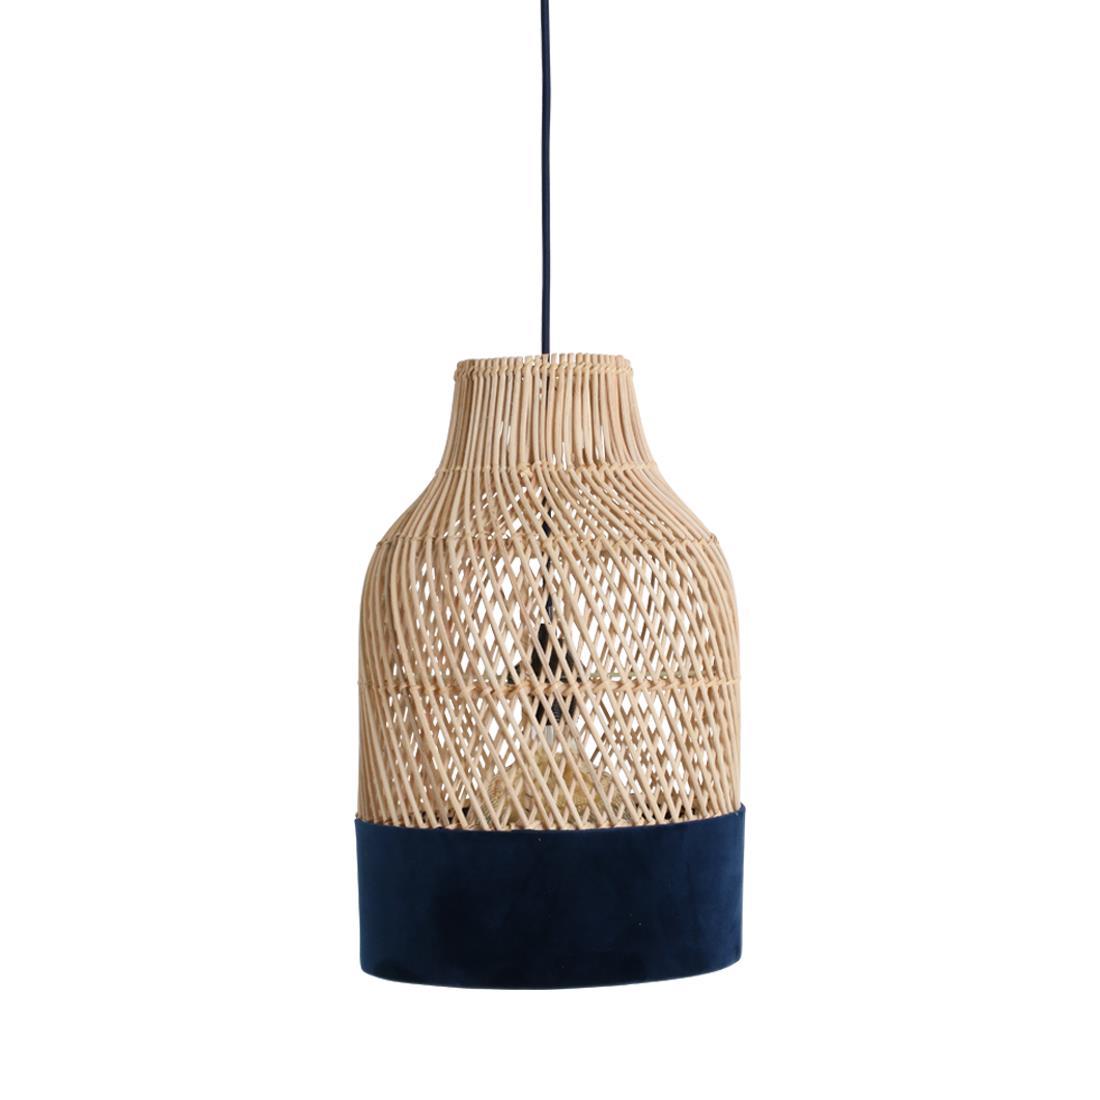 FonQ-Raw Materials Suave Hanglamp Blauw-aanbieding